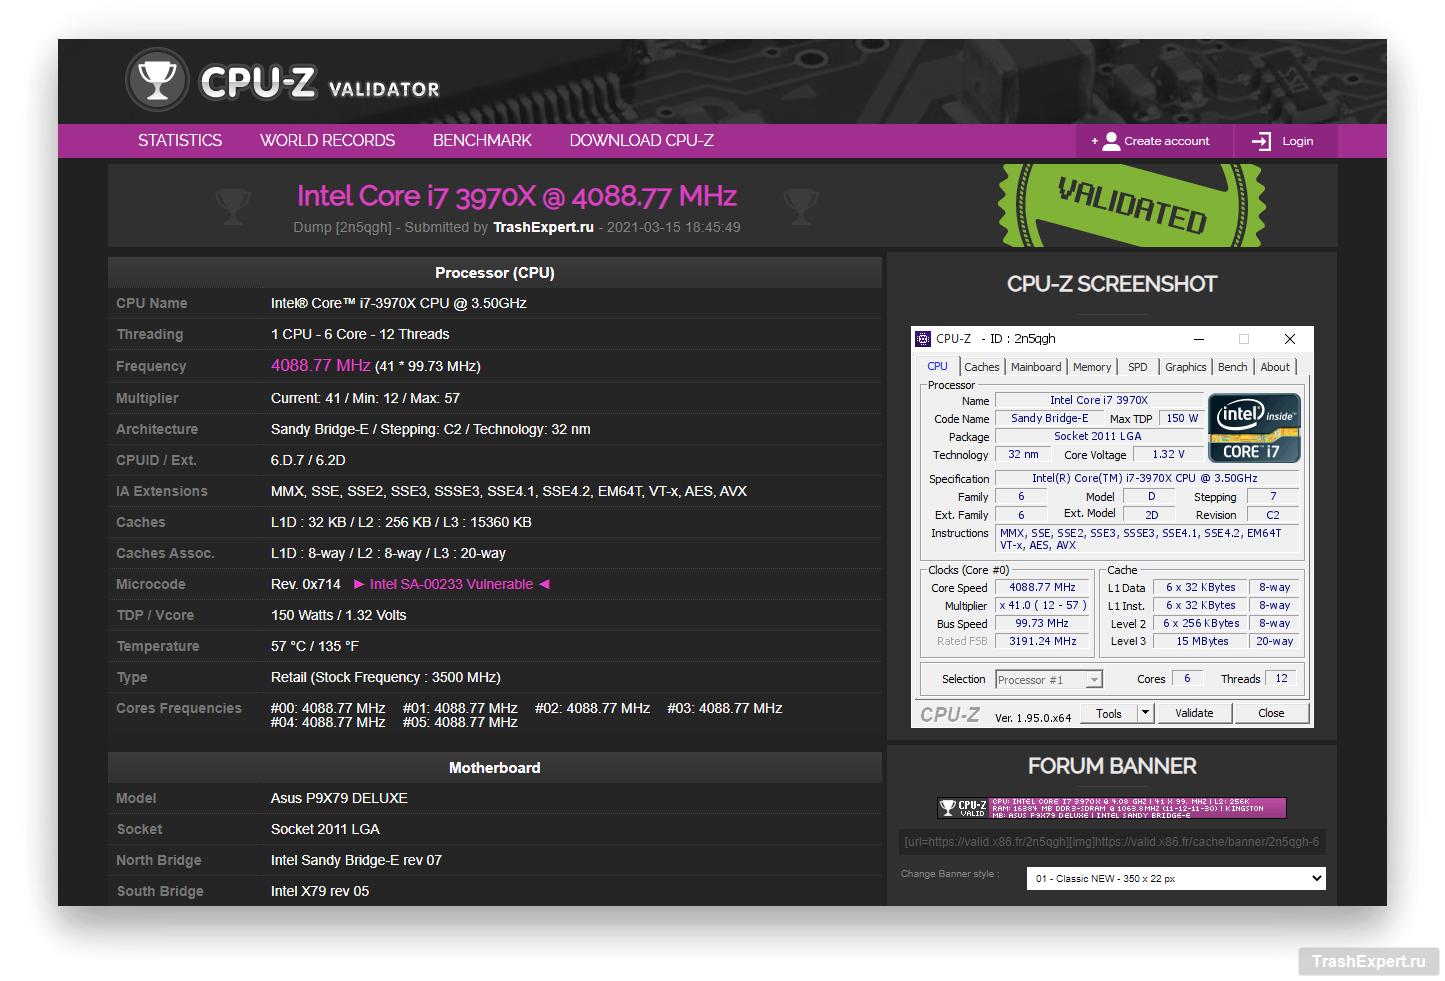 Сайт cpu-z с данными о характеристиках процессора